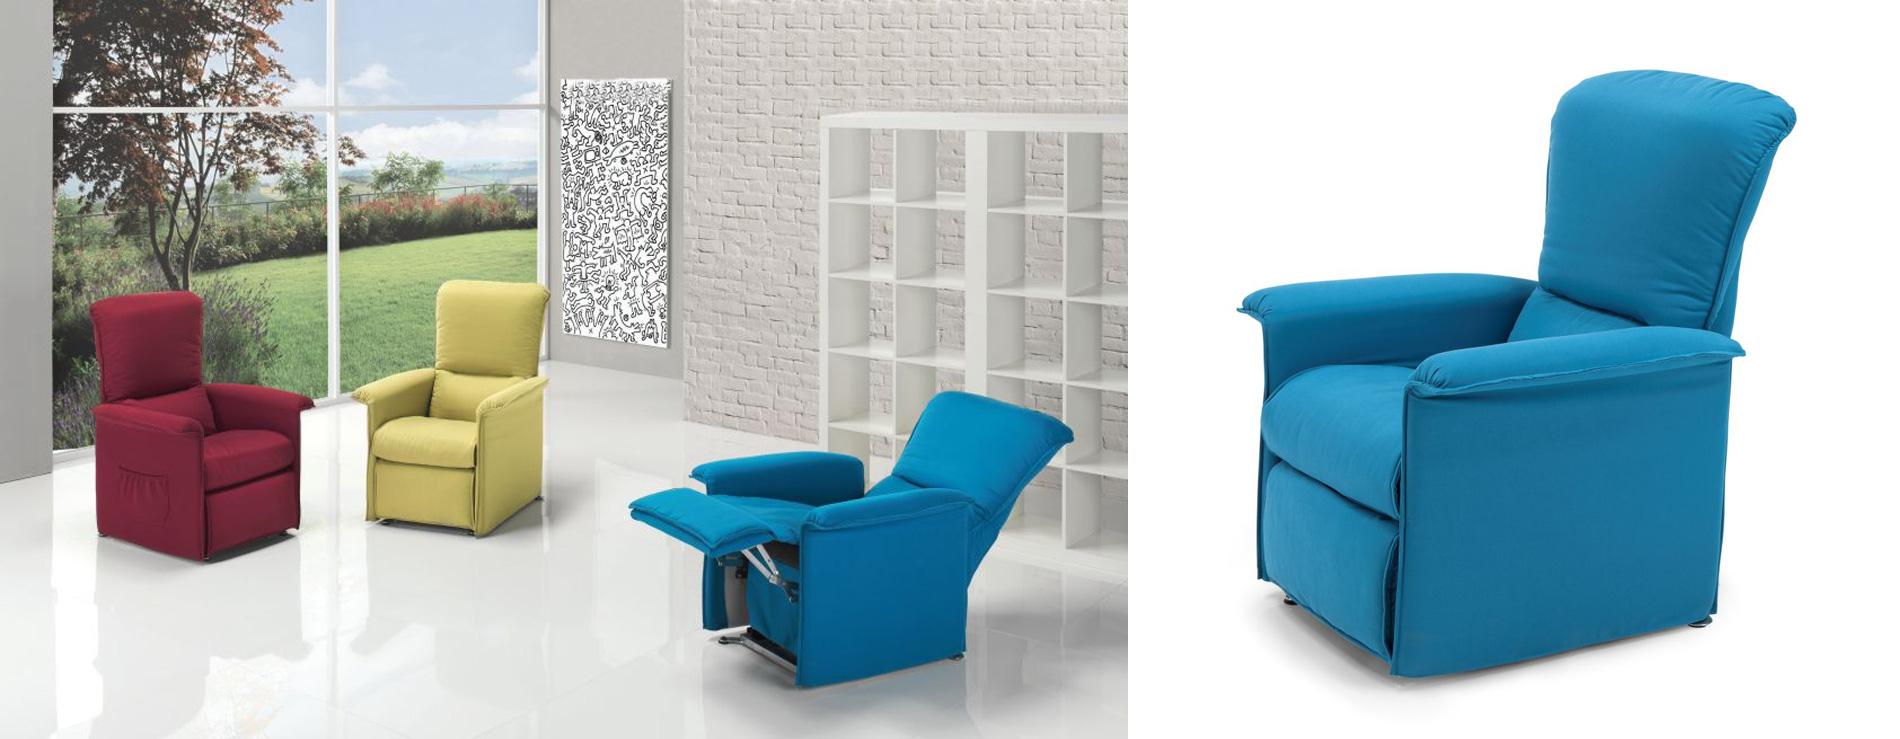 Poltrona Relax Cube | Spazio Relax